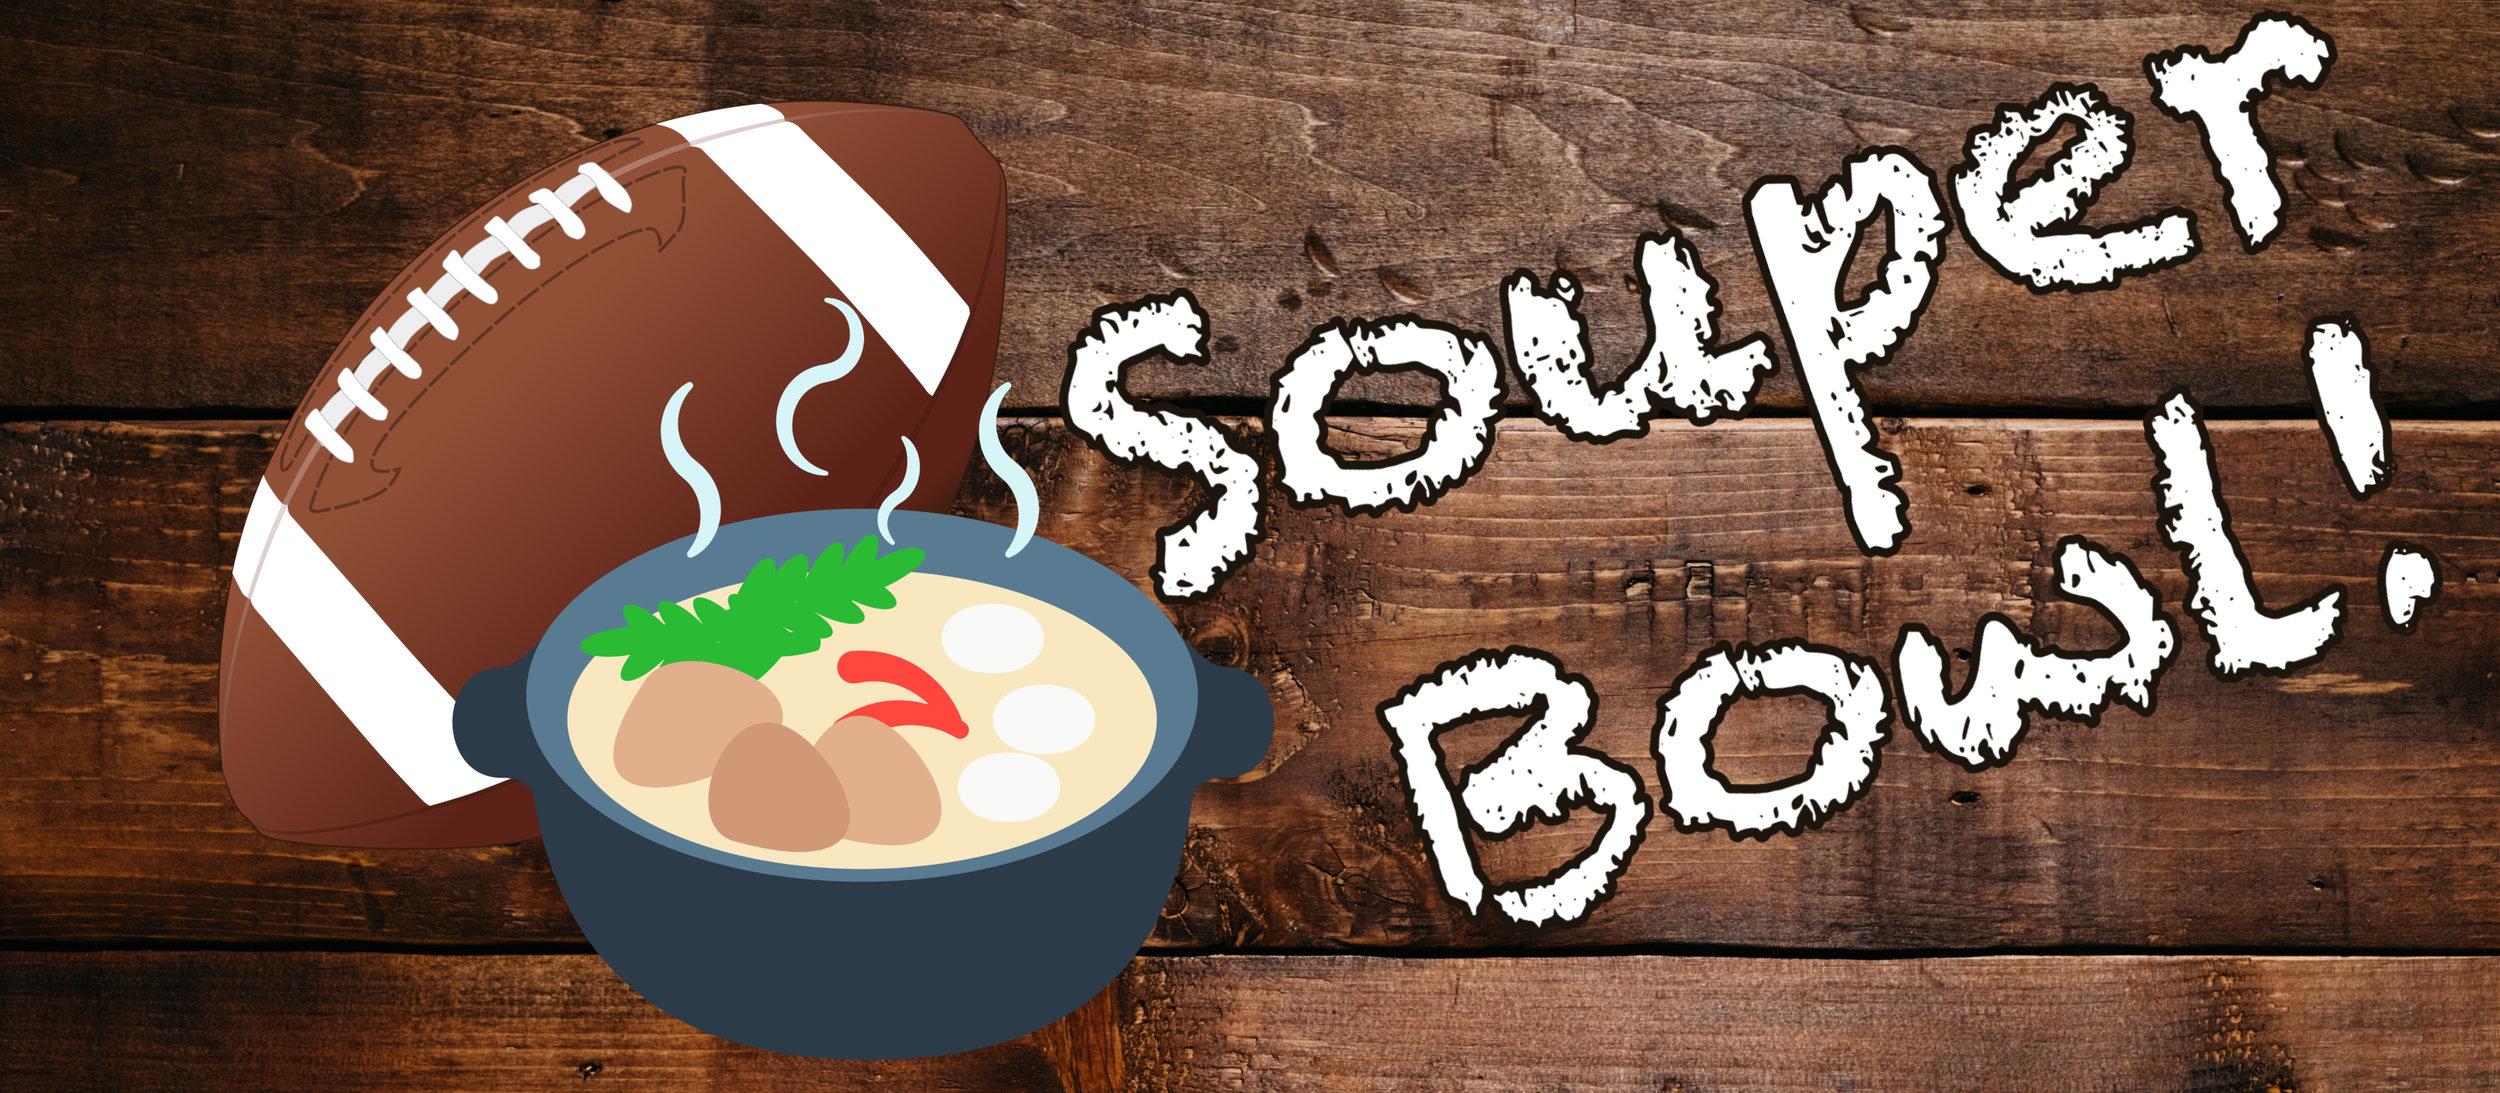 Souper Bowl — HERITAGE Fellowship